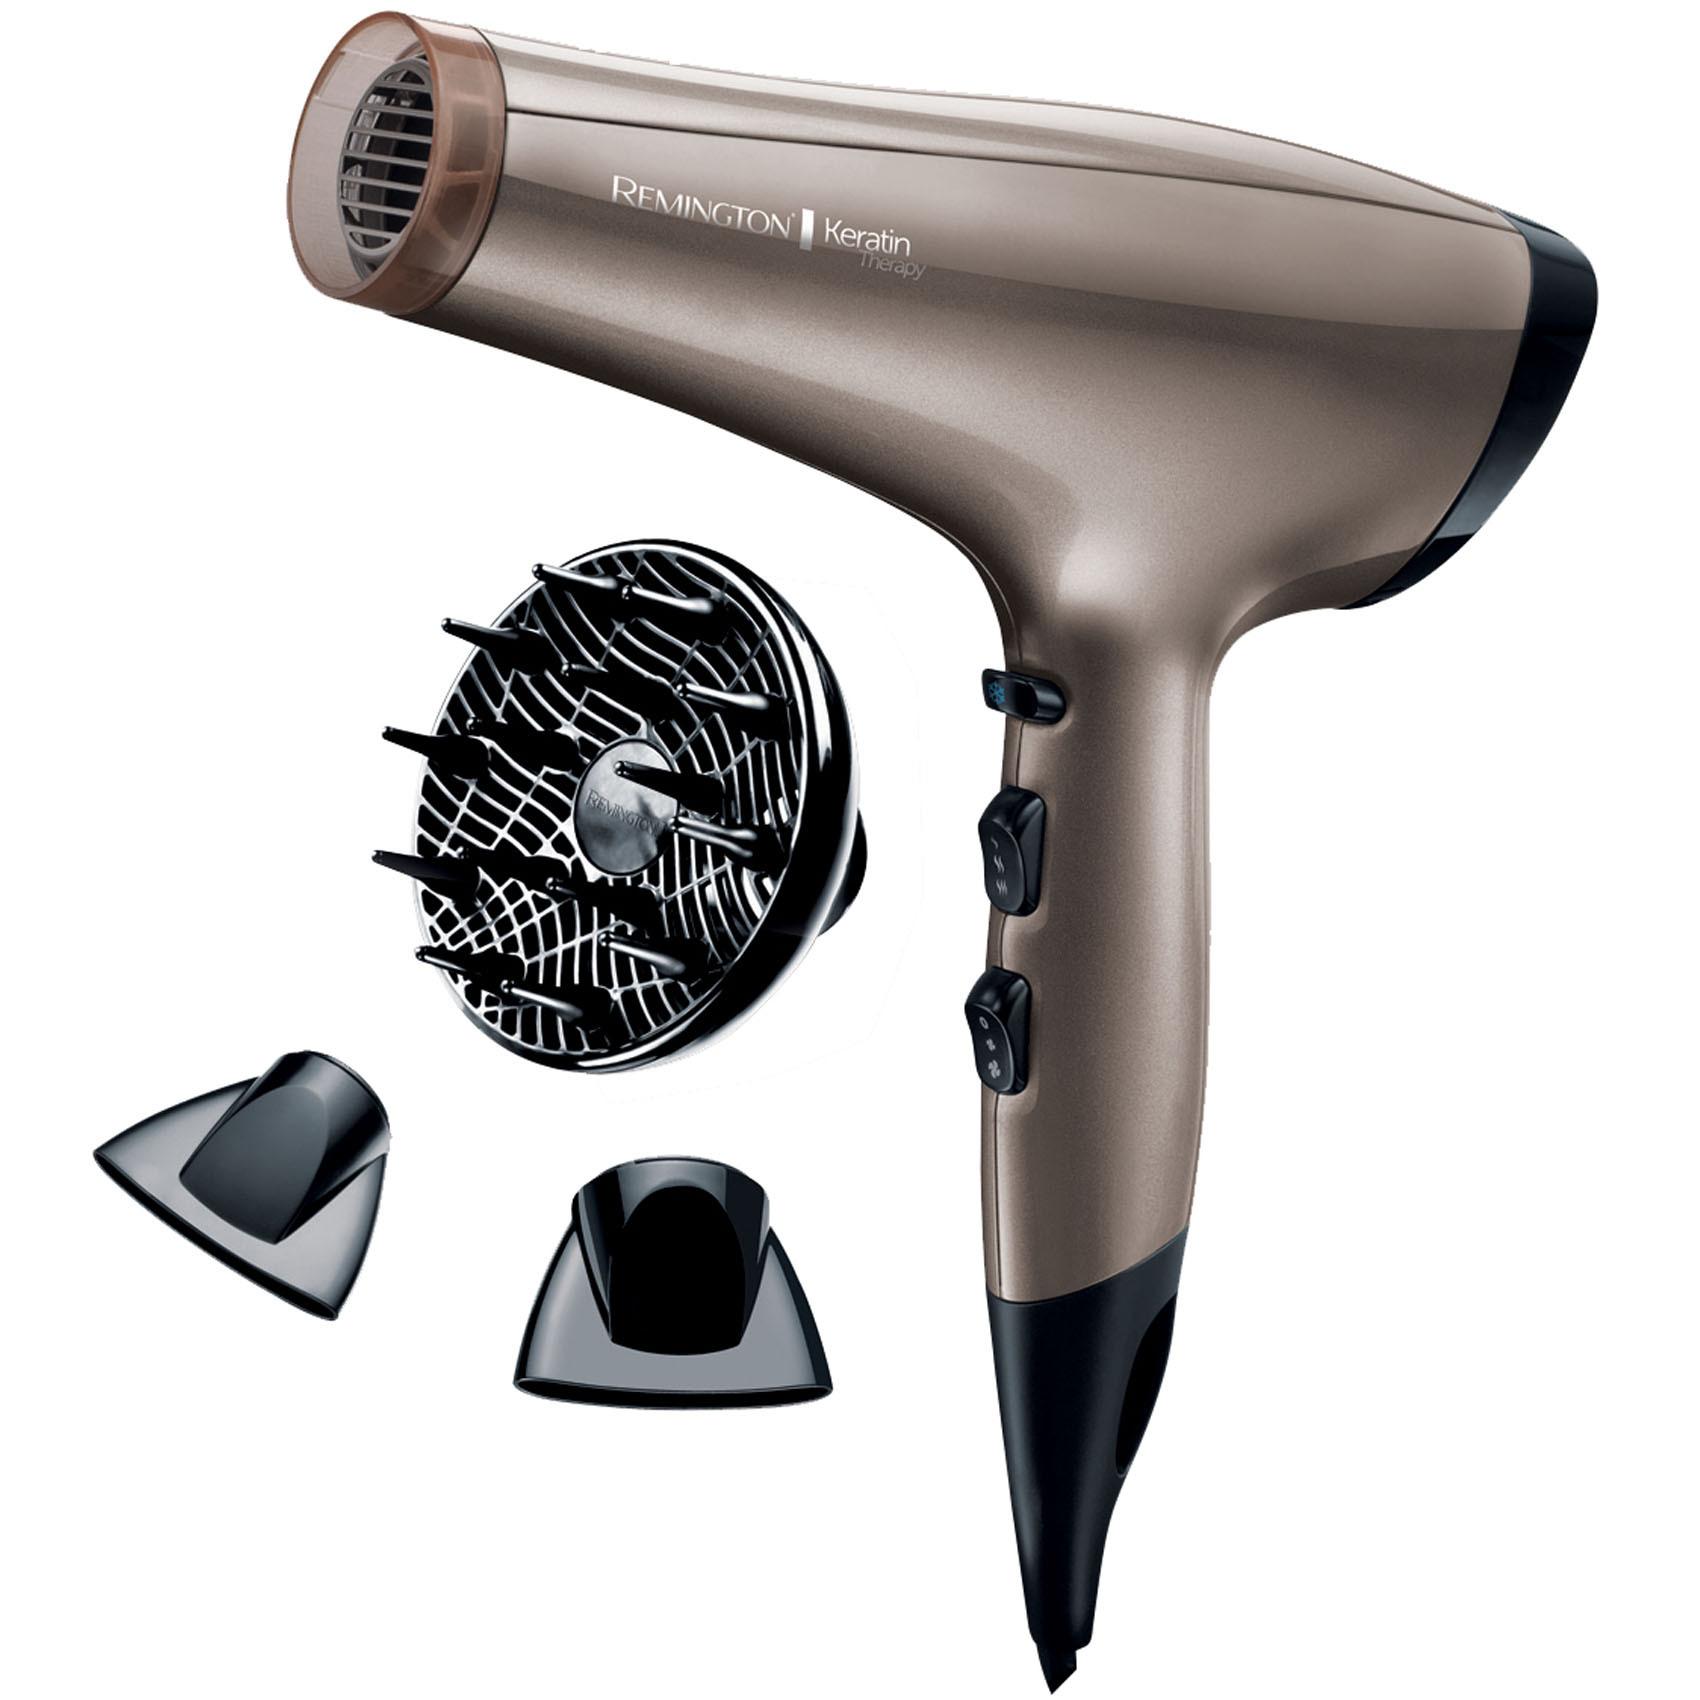 REMINGTON HAIR DRYER REAC8000